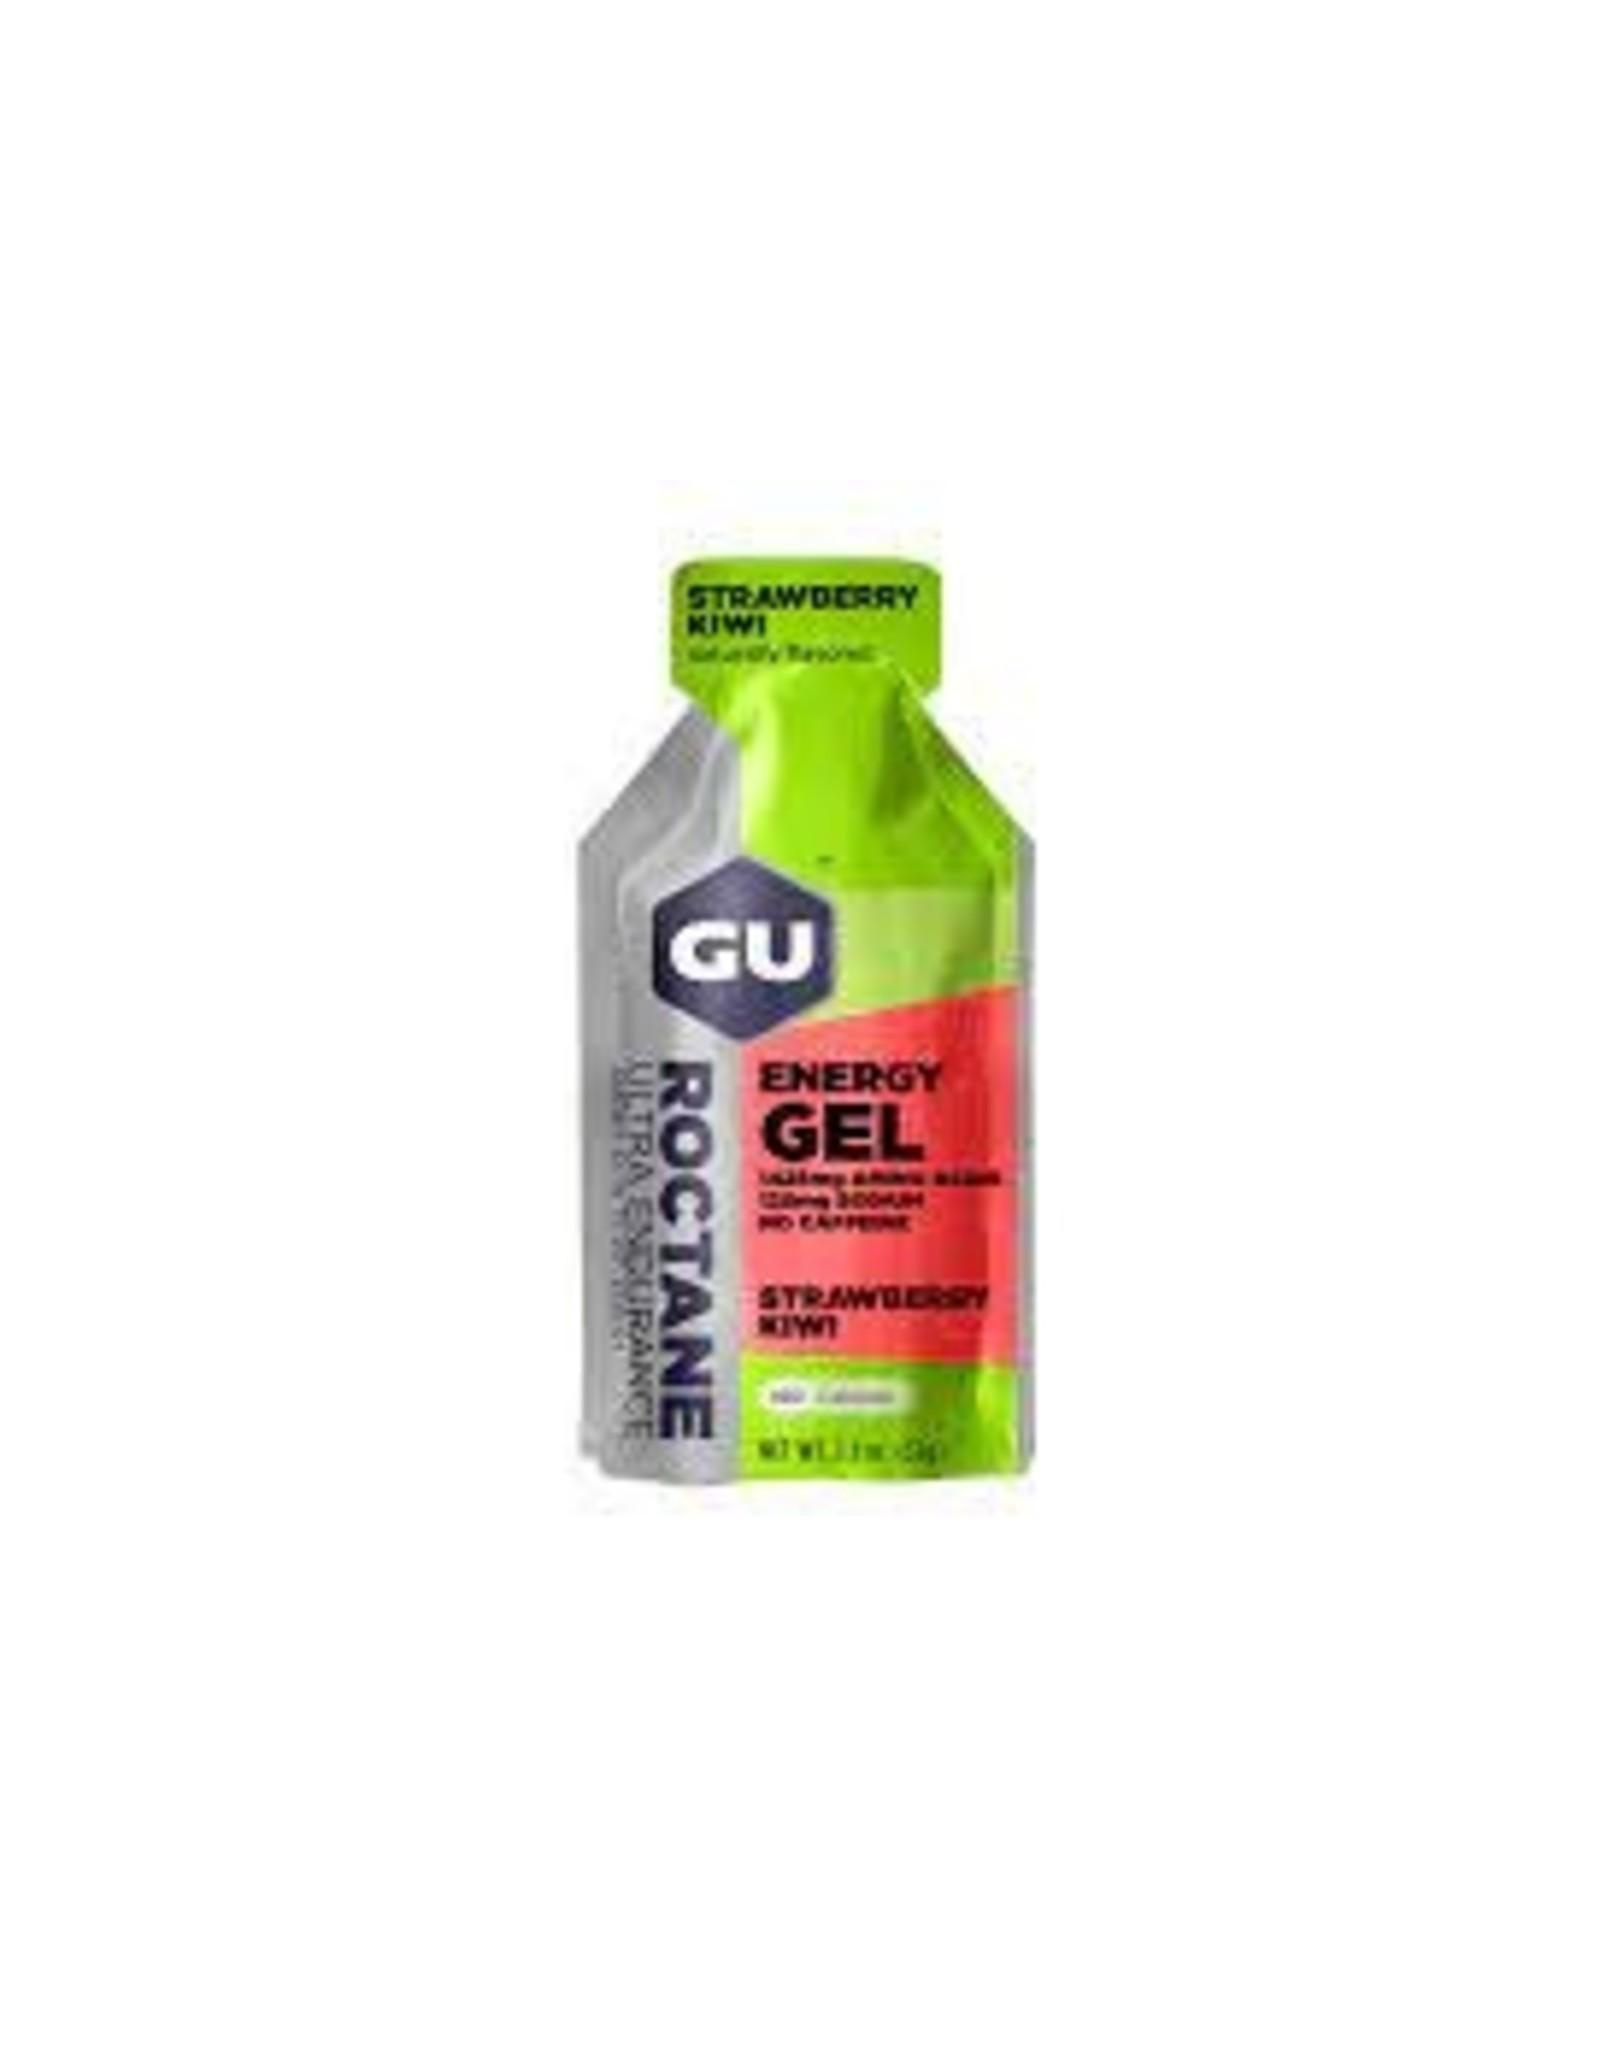 GU Energy Labs GU Roctane Strawberry Kiwi Box of 24 single